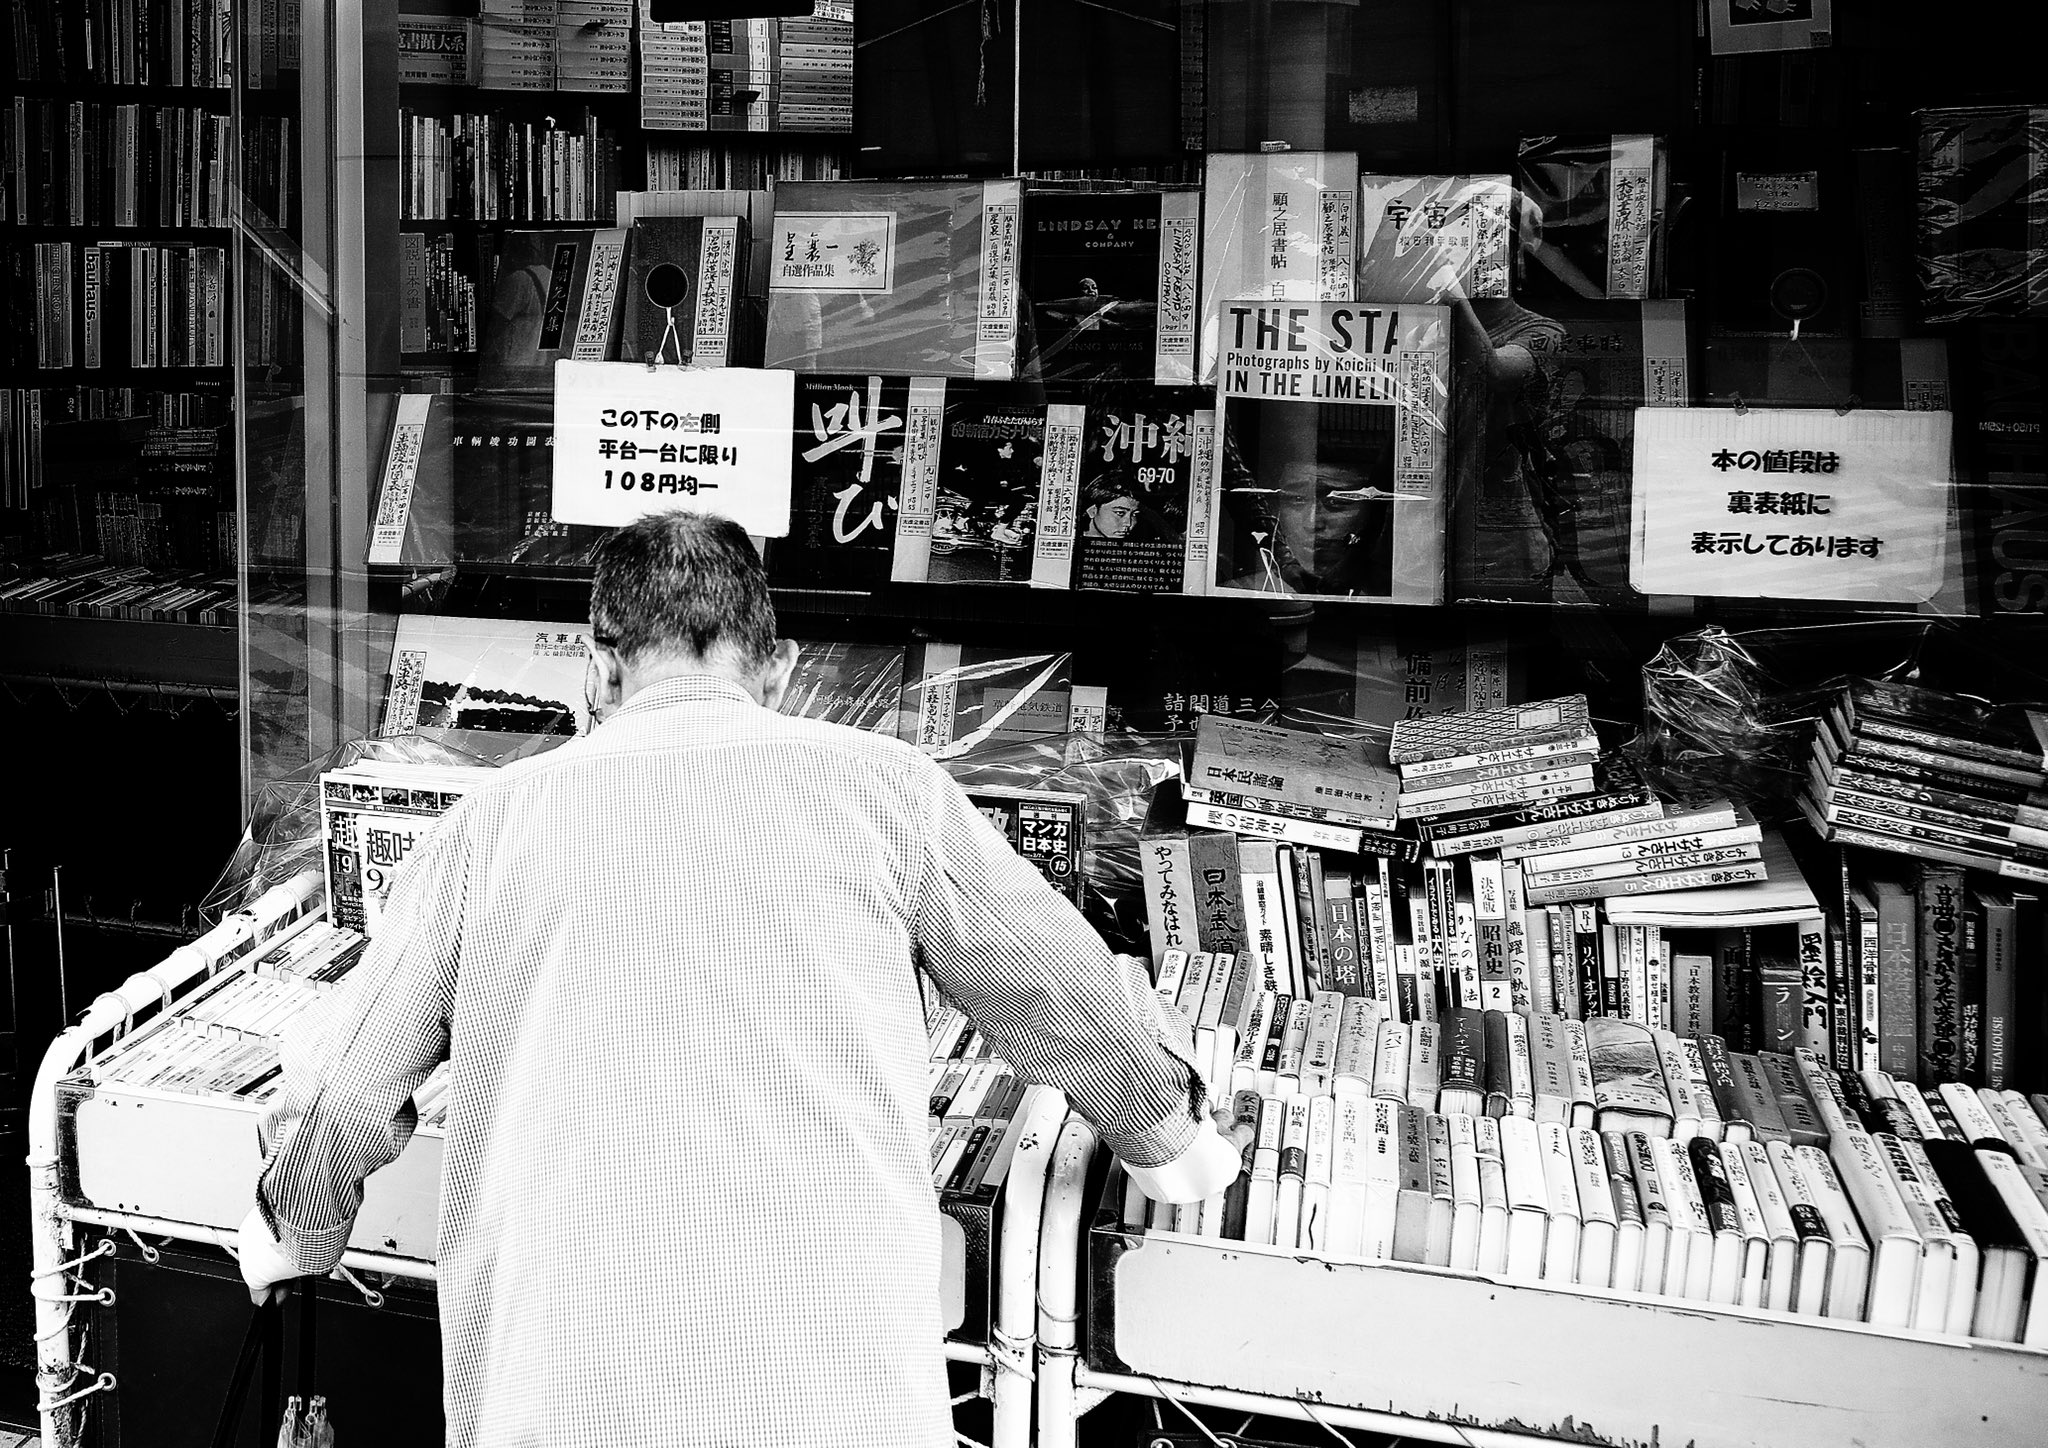 black_and_white_street_photography_3.jpg